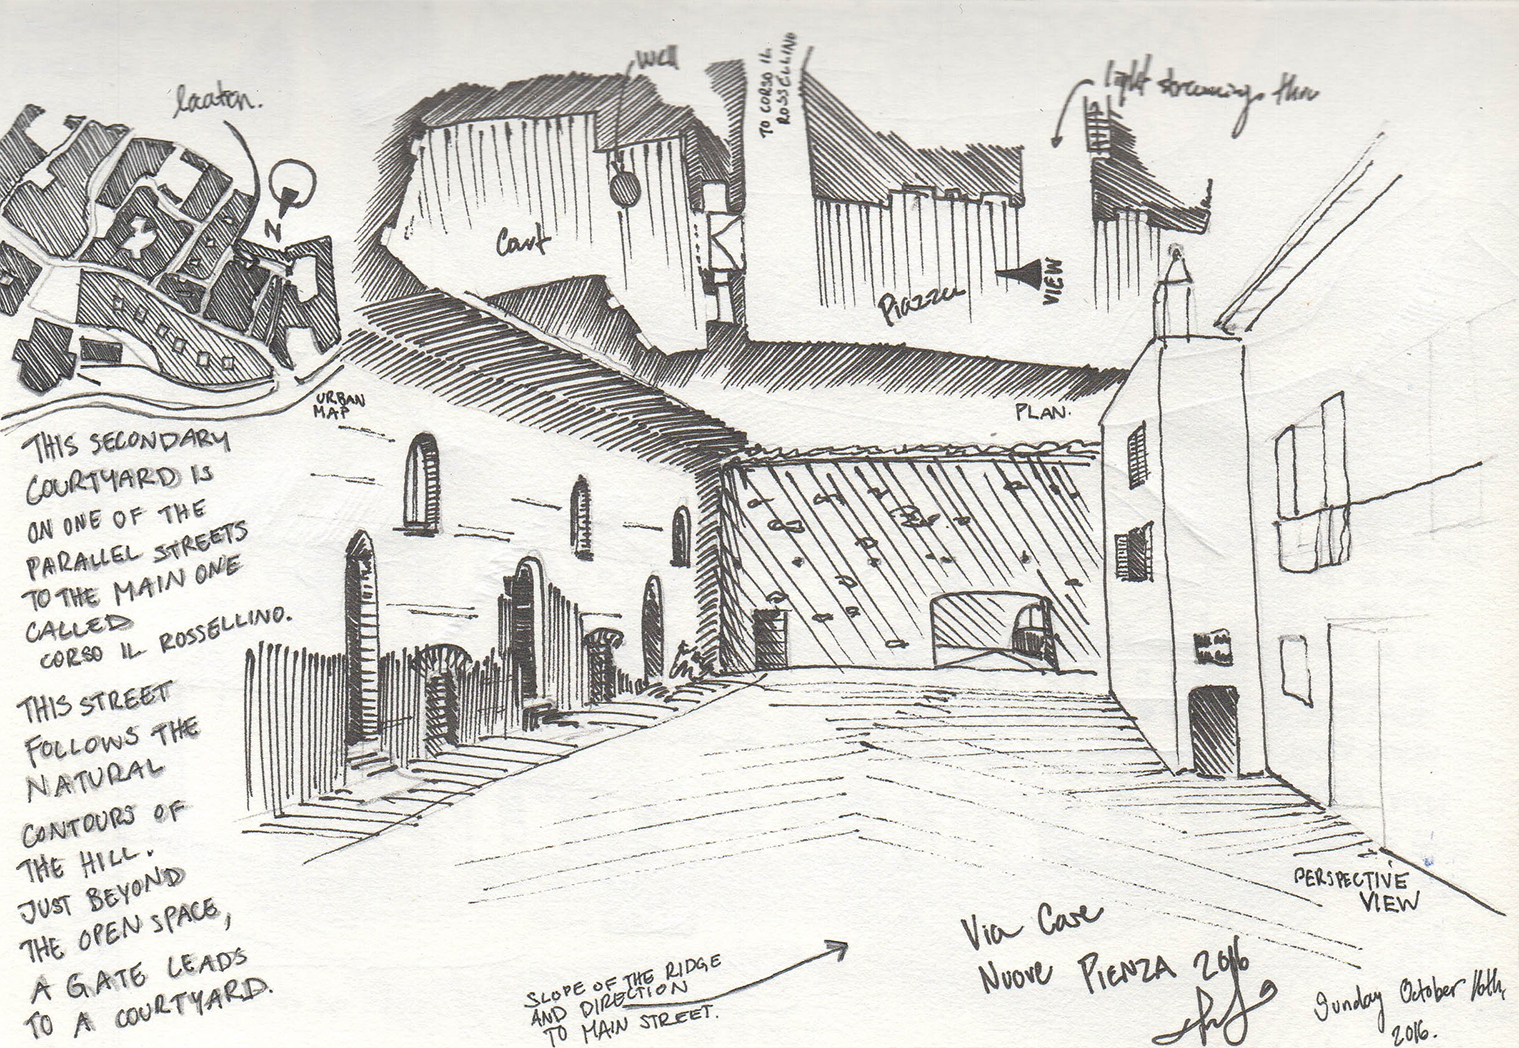 Rome-Sketchbook-Edited-Scans-26-forweb.jpg